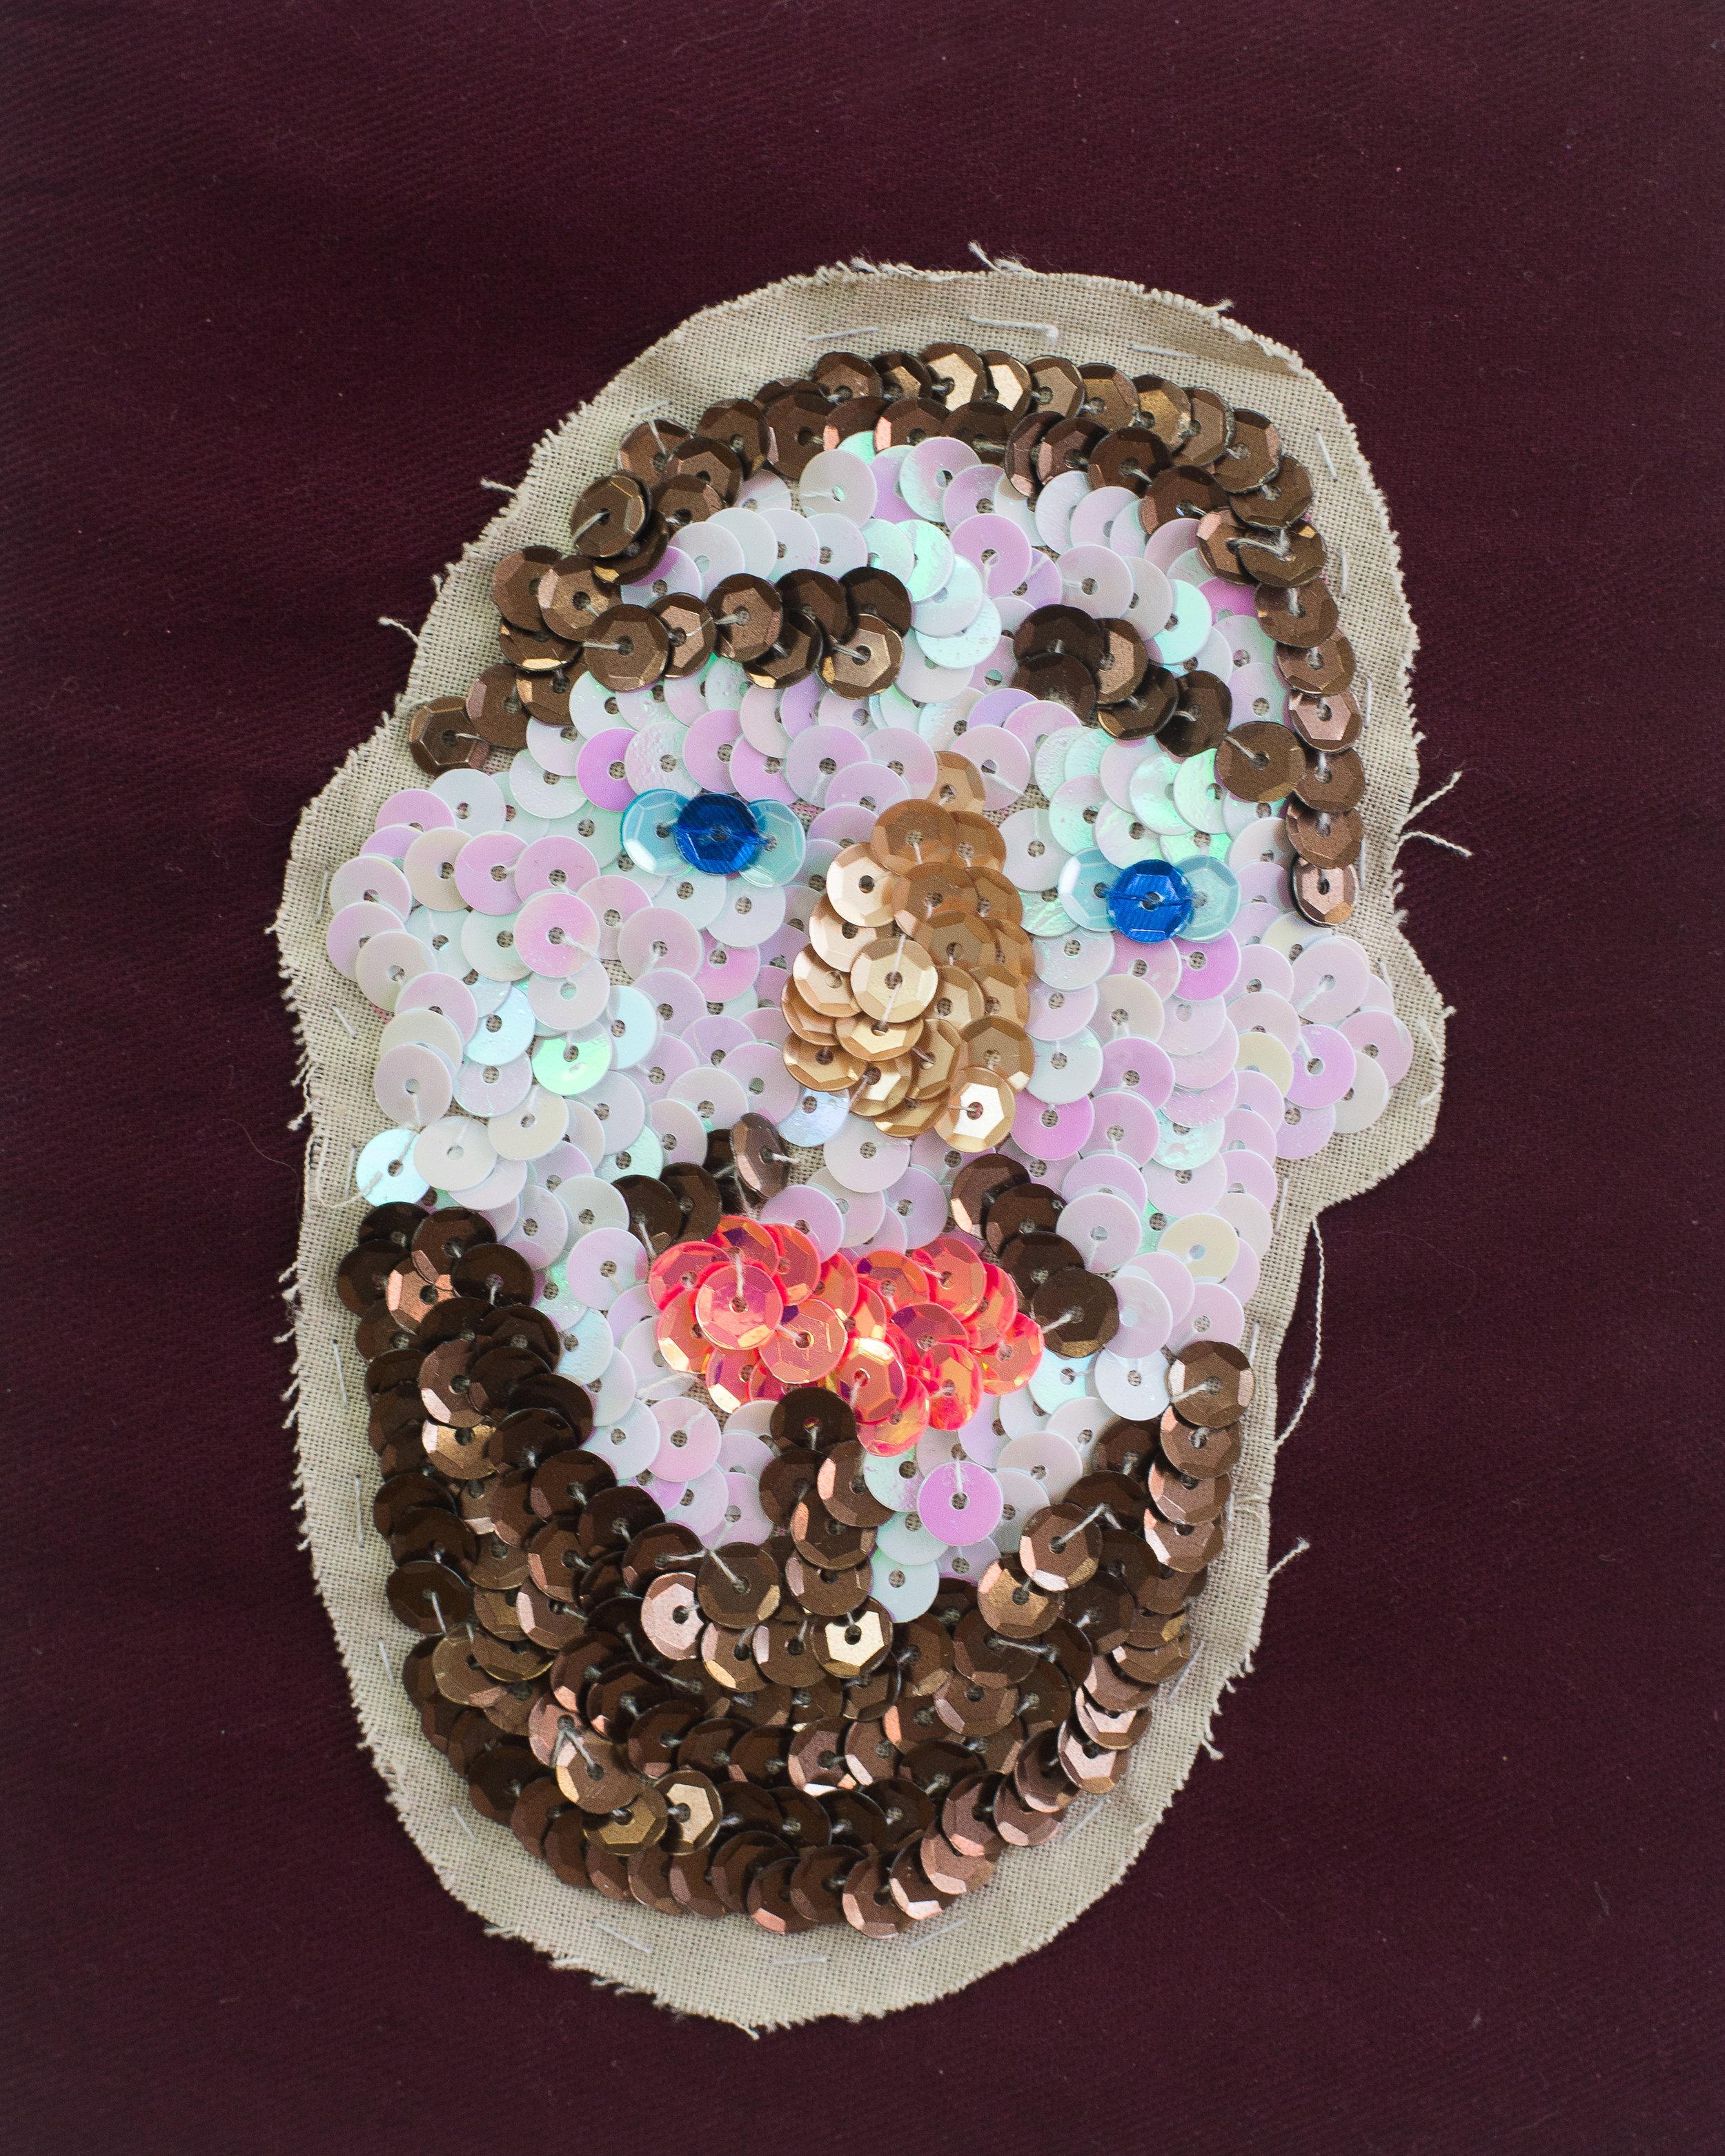 Duncan (A talisman for successful tindering) (Detail) Cotton, sequins, paper mache, dowel, glitter